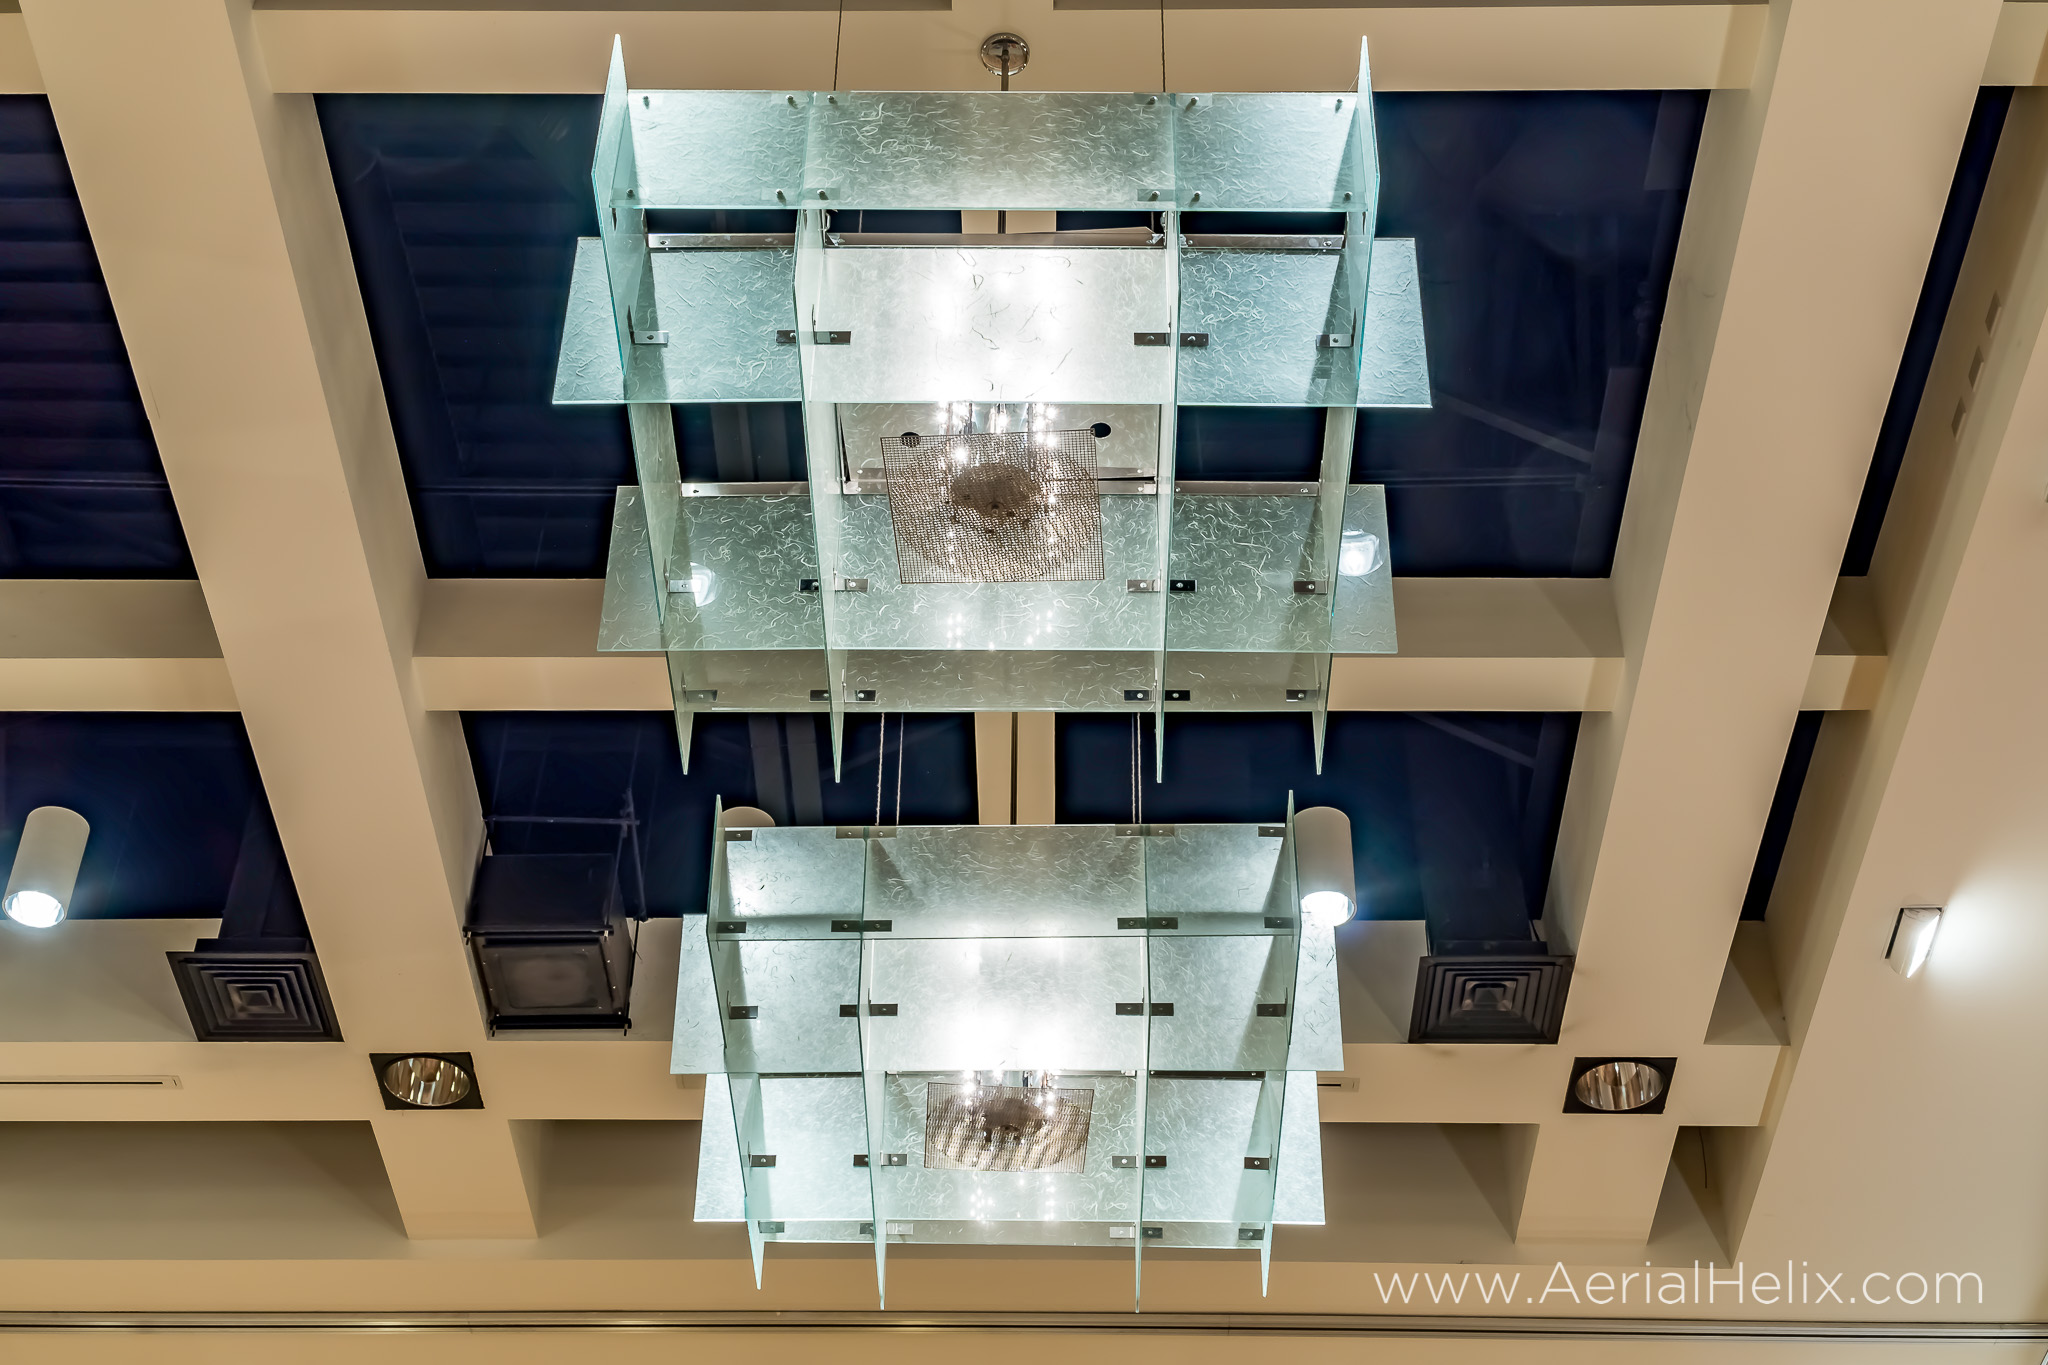 Indian Wells Hyatt Regency Set 1-13.jpg